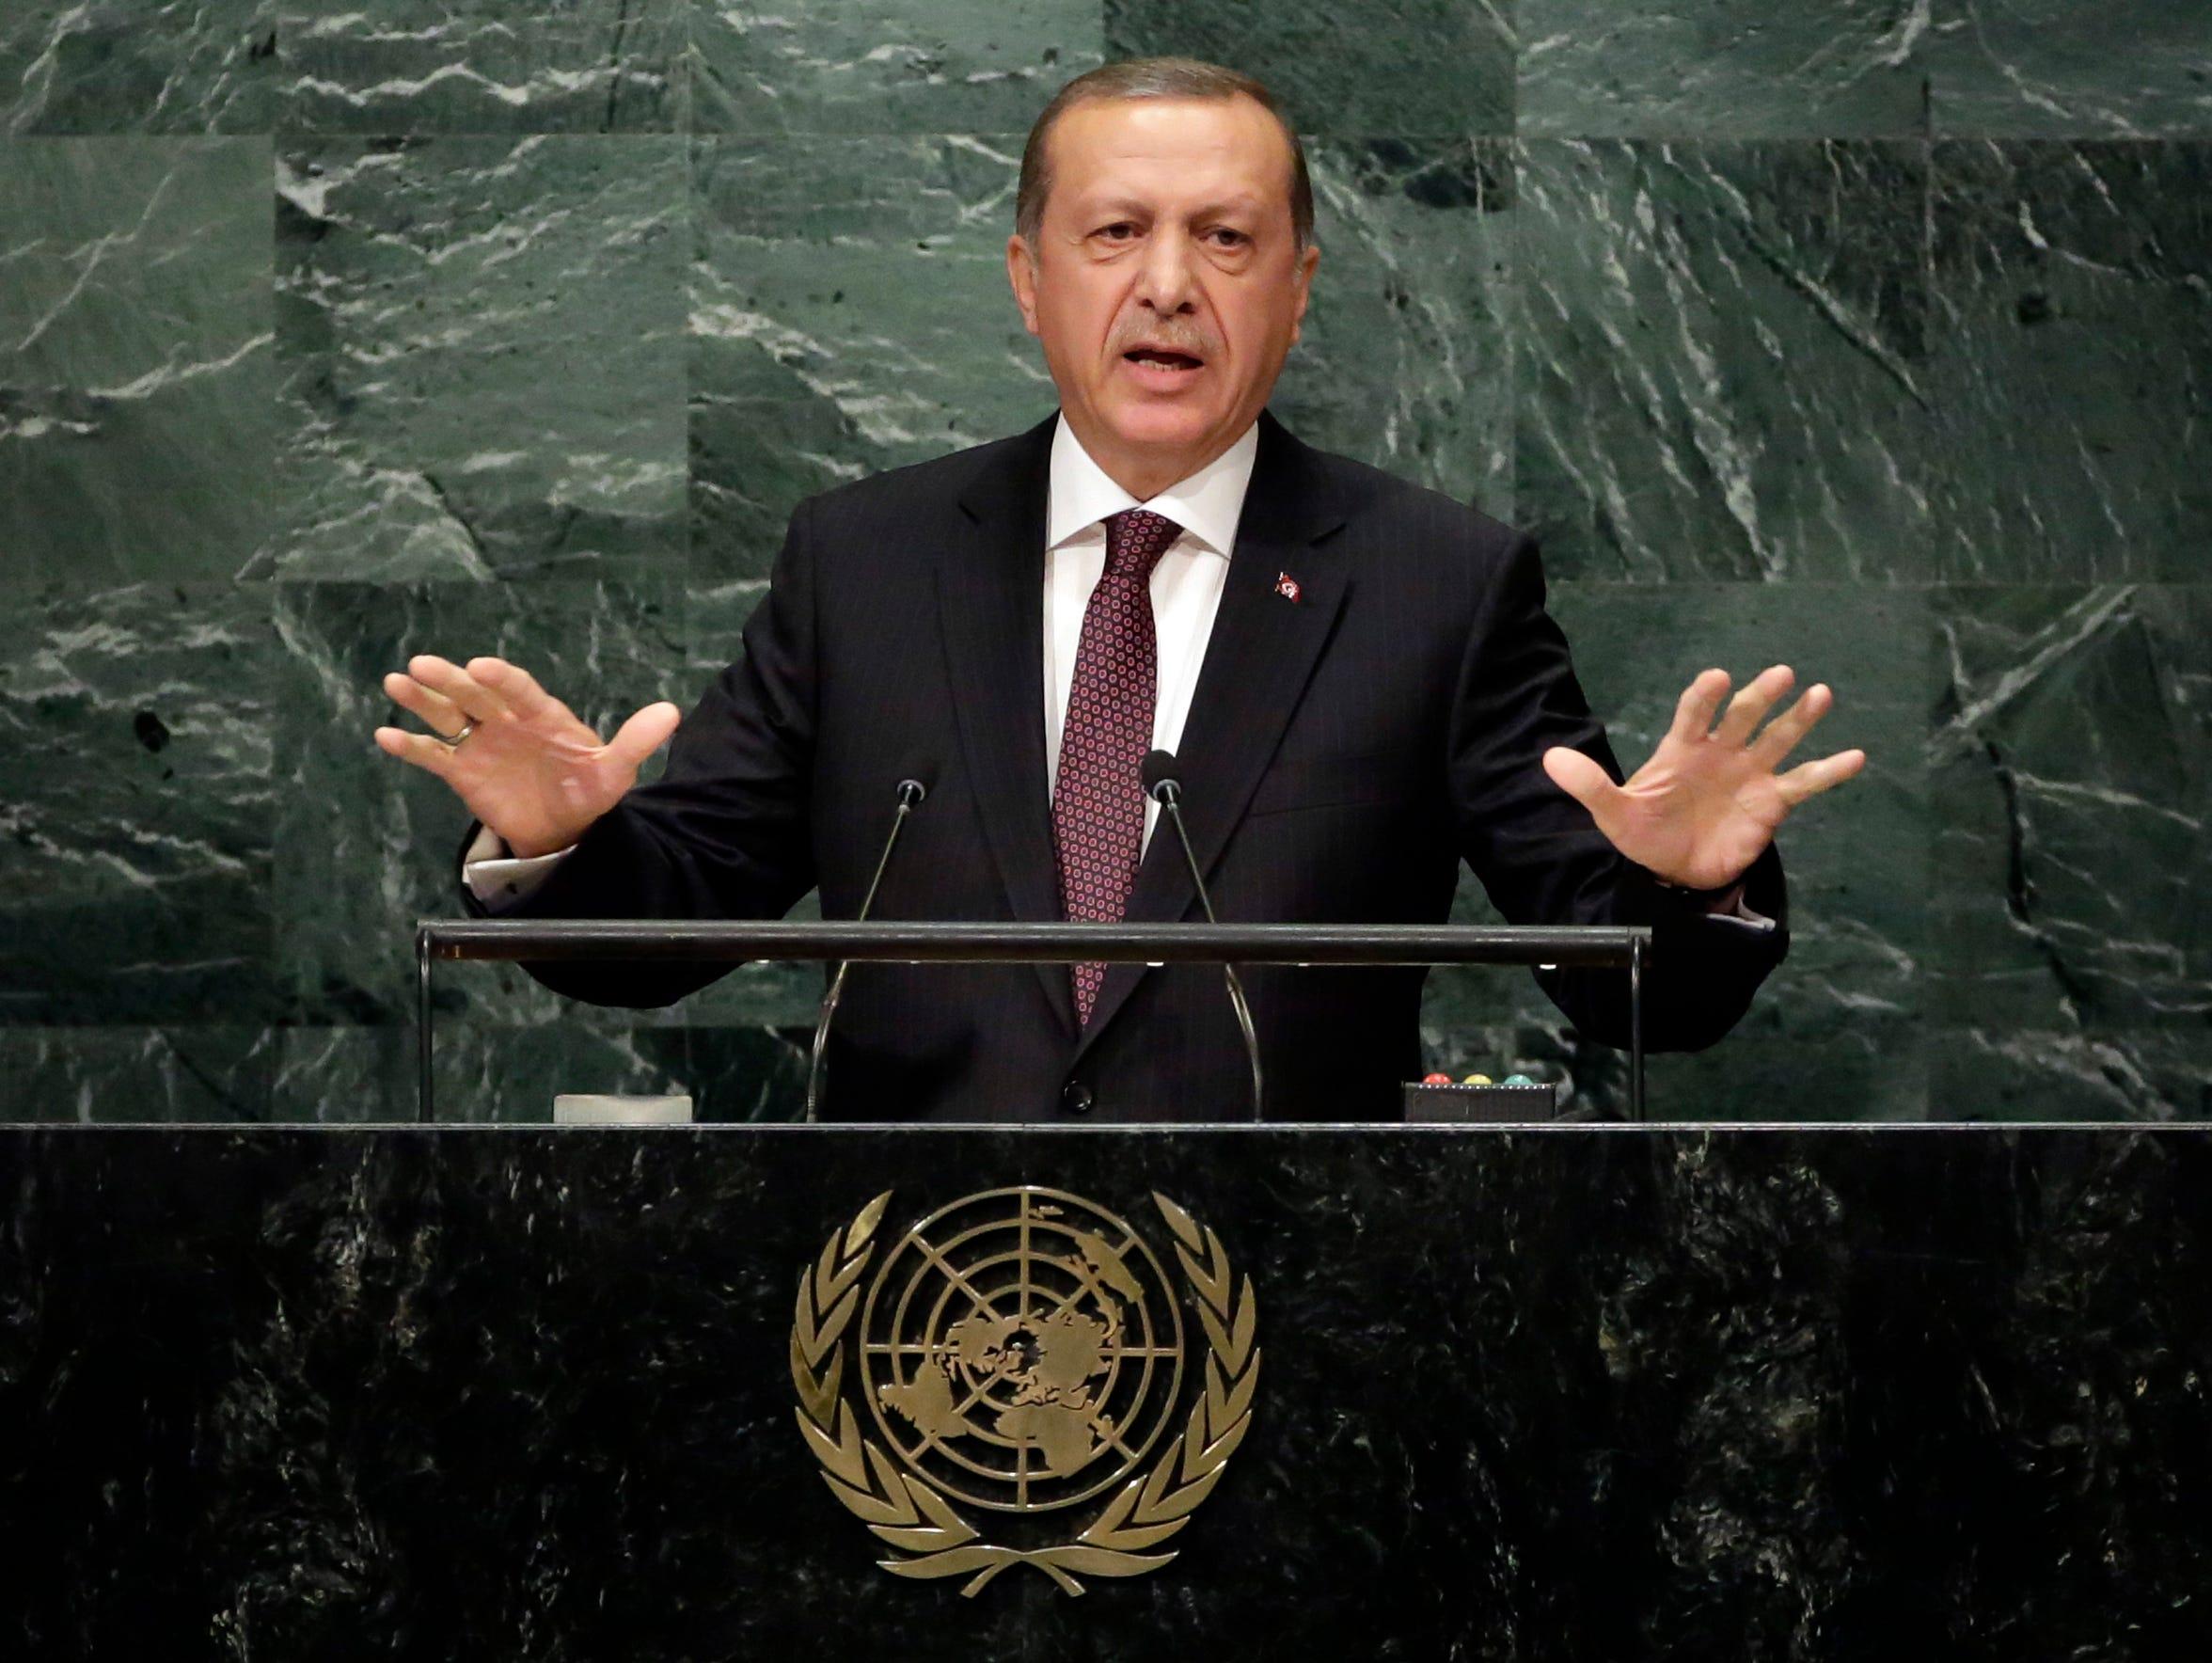 Turkey's President Recep Tayyip Erdogan addresses the